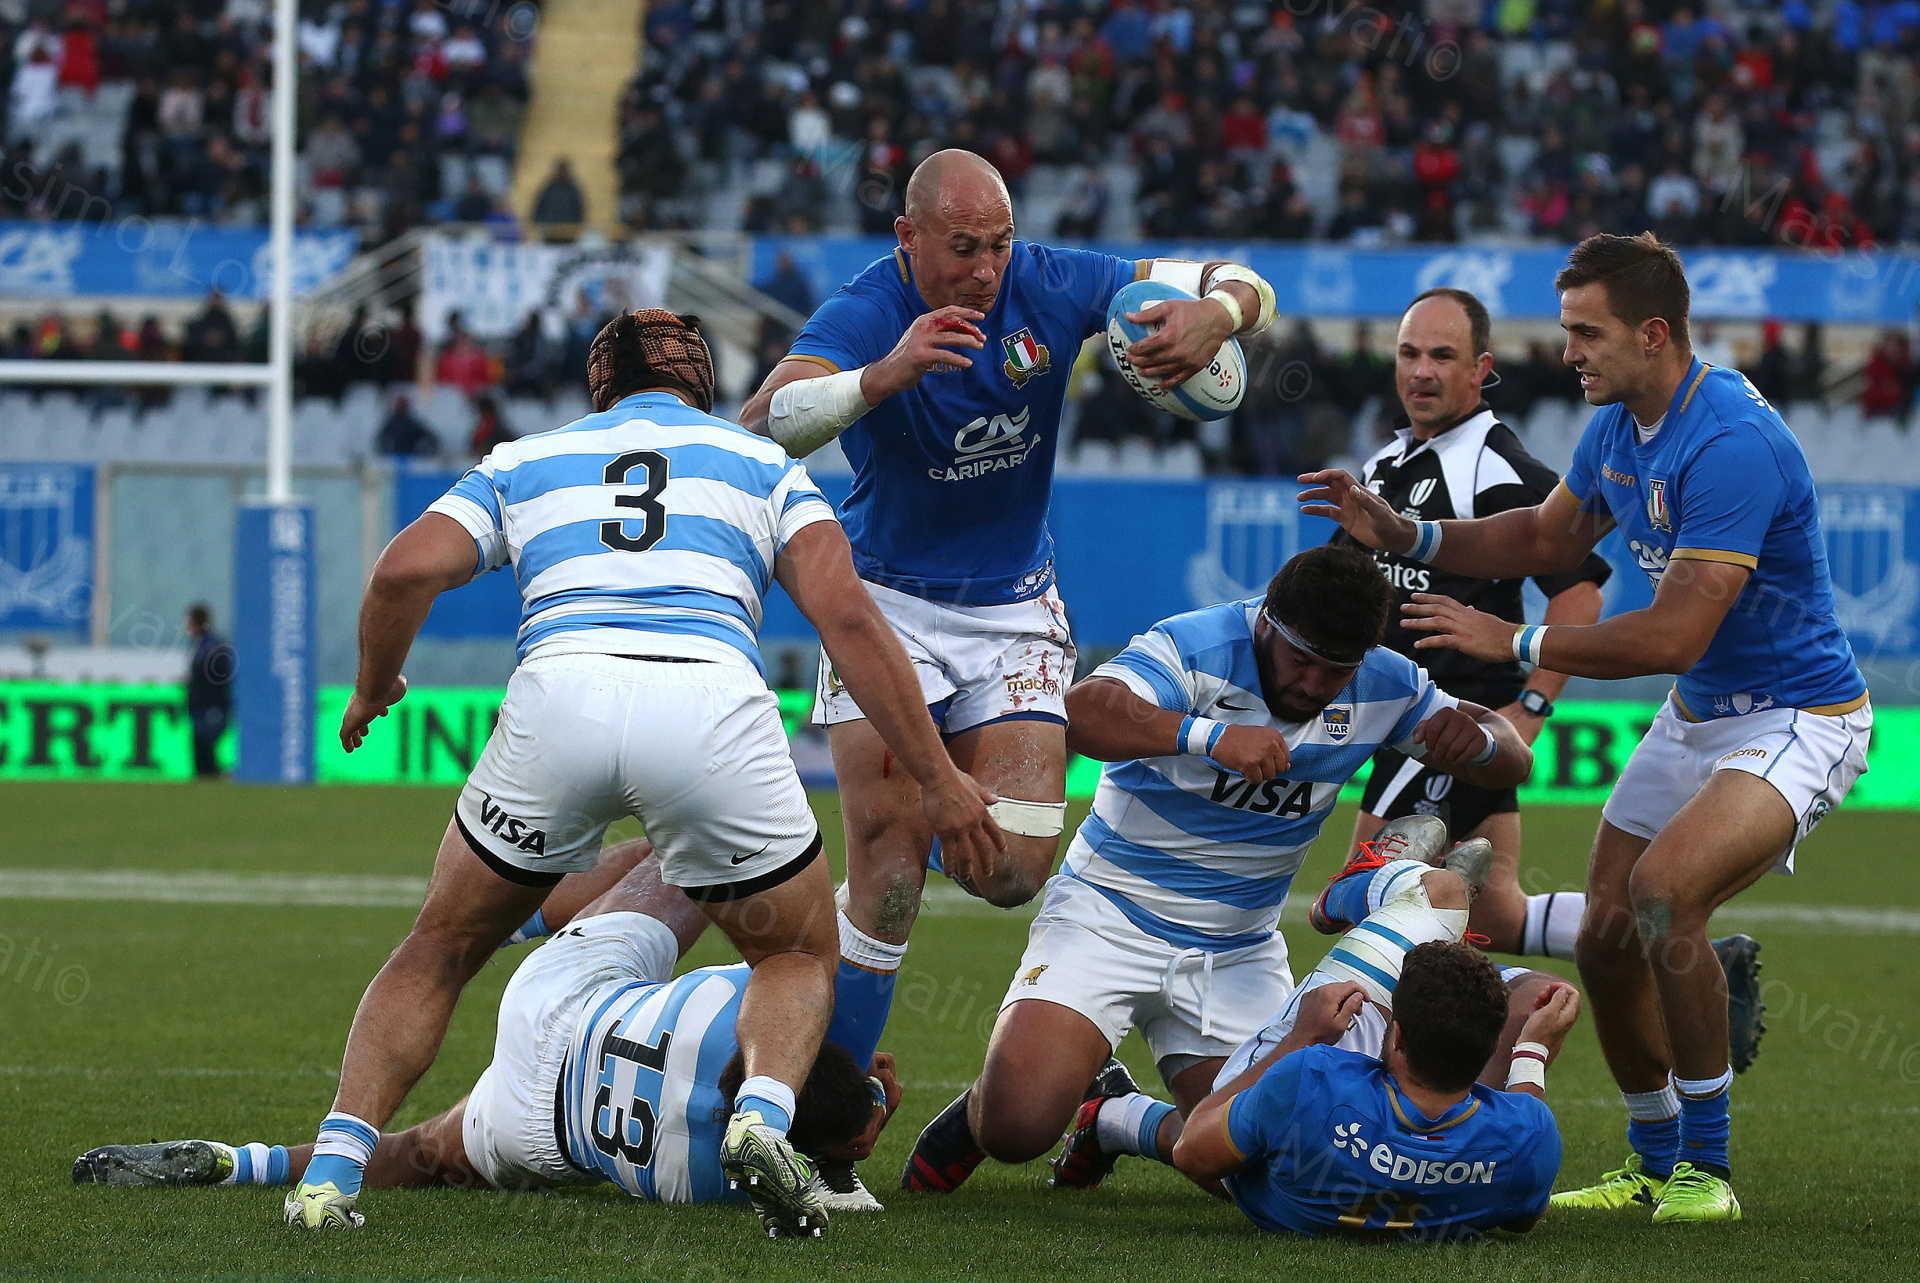 18/11/2017 Firenze,Rugby, Test Match Italia - Argentina nella foto Sergio Parisse